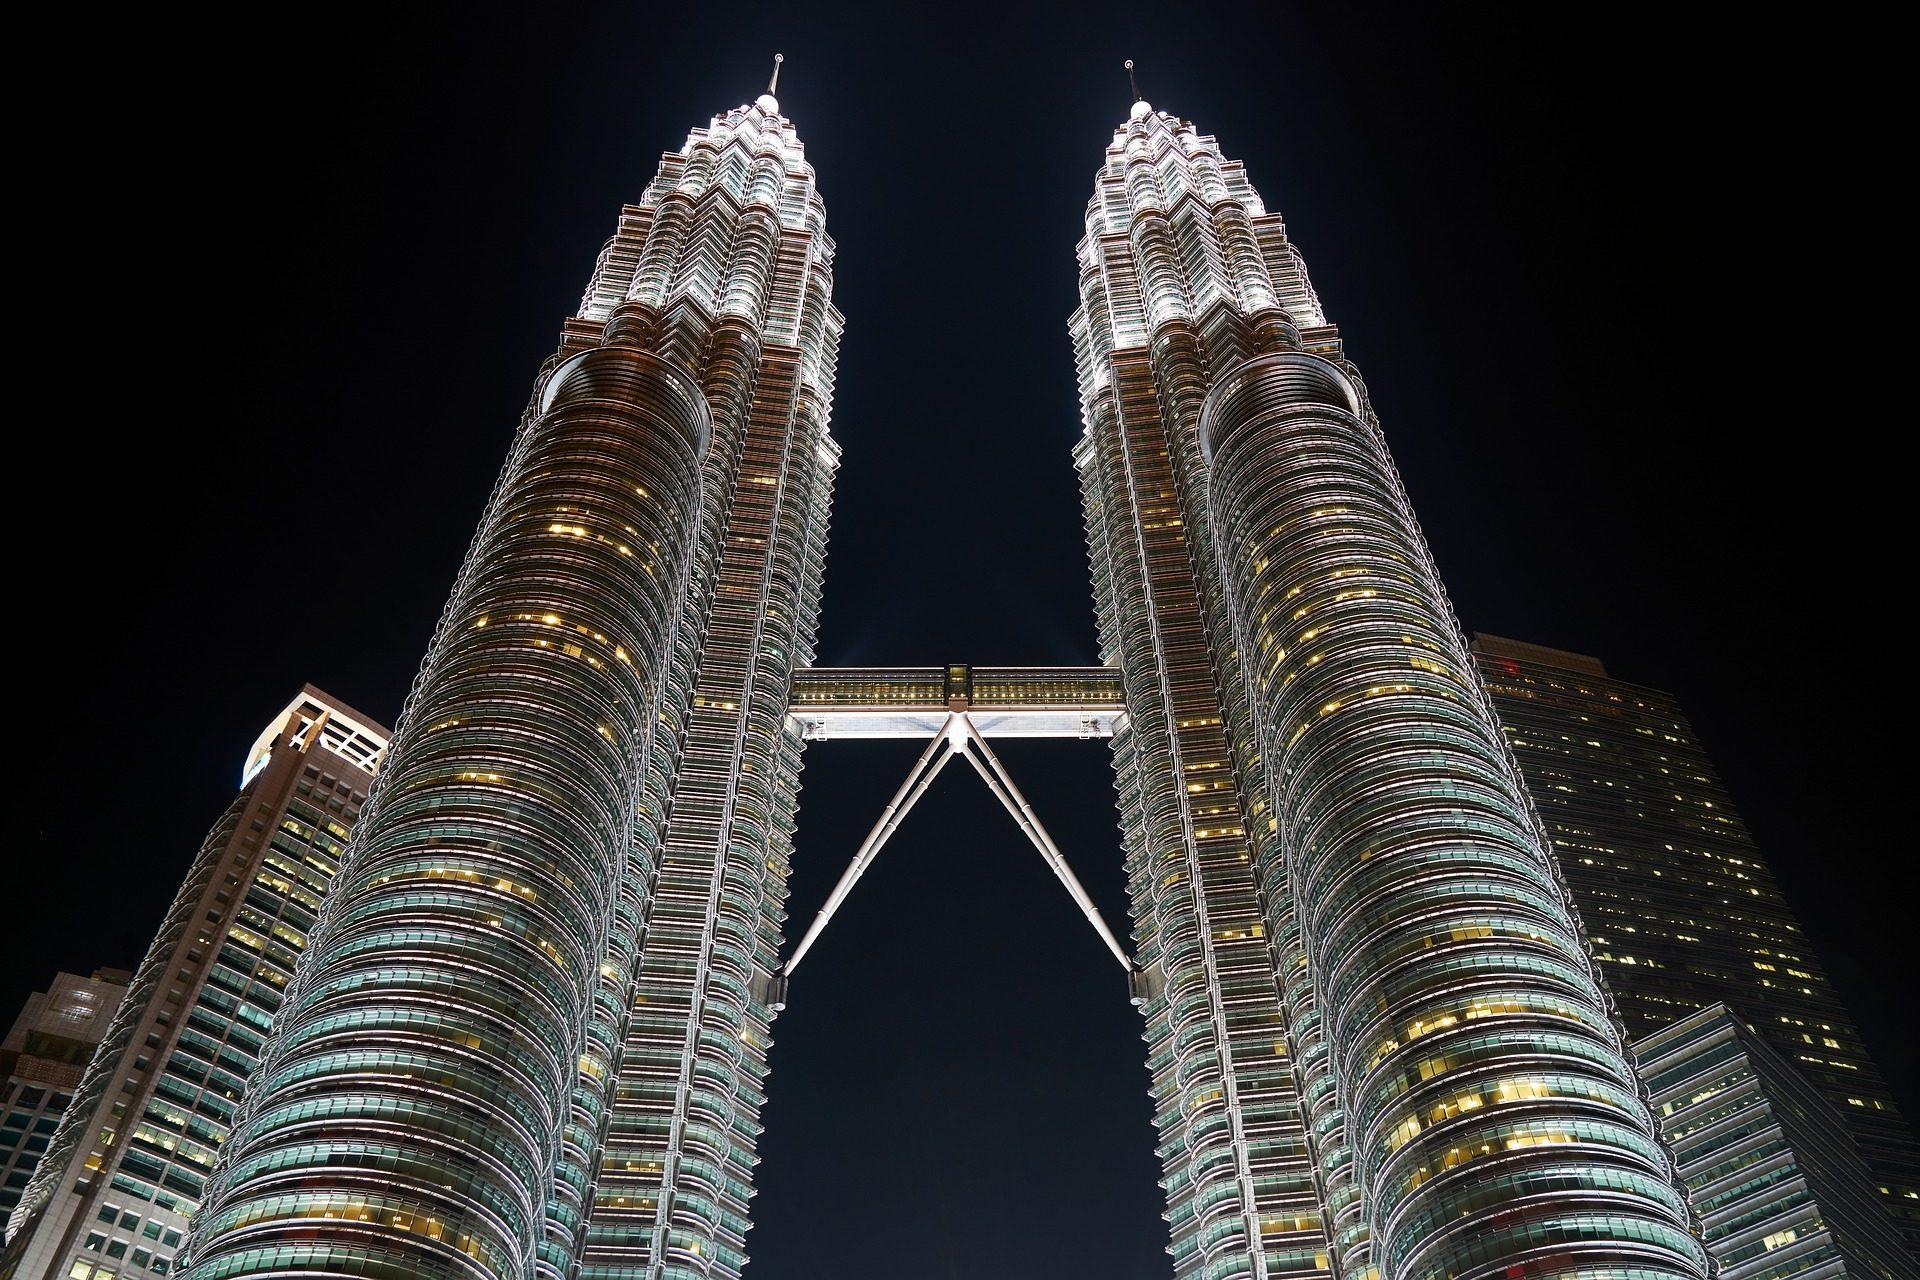 edificio, rascacielos, luces, noche, altura, malasia - Fondos de Pantalla HD - professor-falken.com